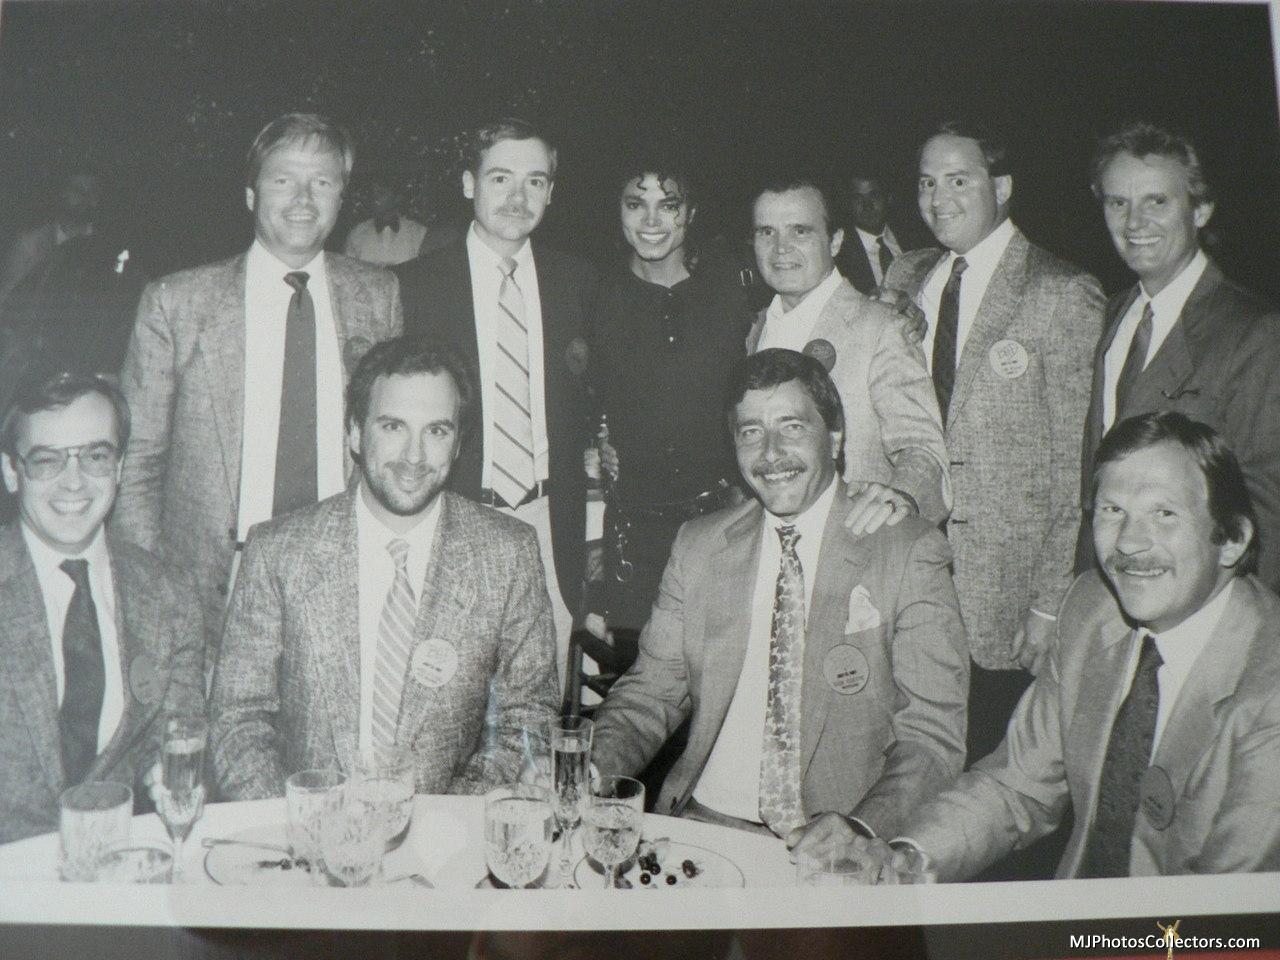 Raridades: Somente fotos RARAS de Michael Jackson. - Página 6 Gallery_7_42_97160